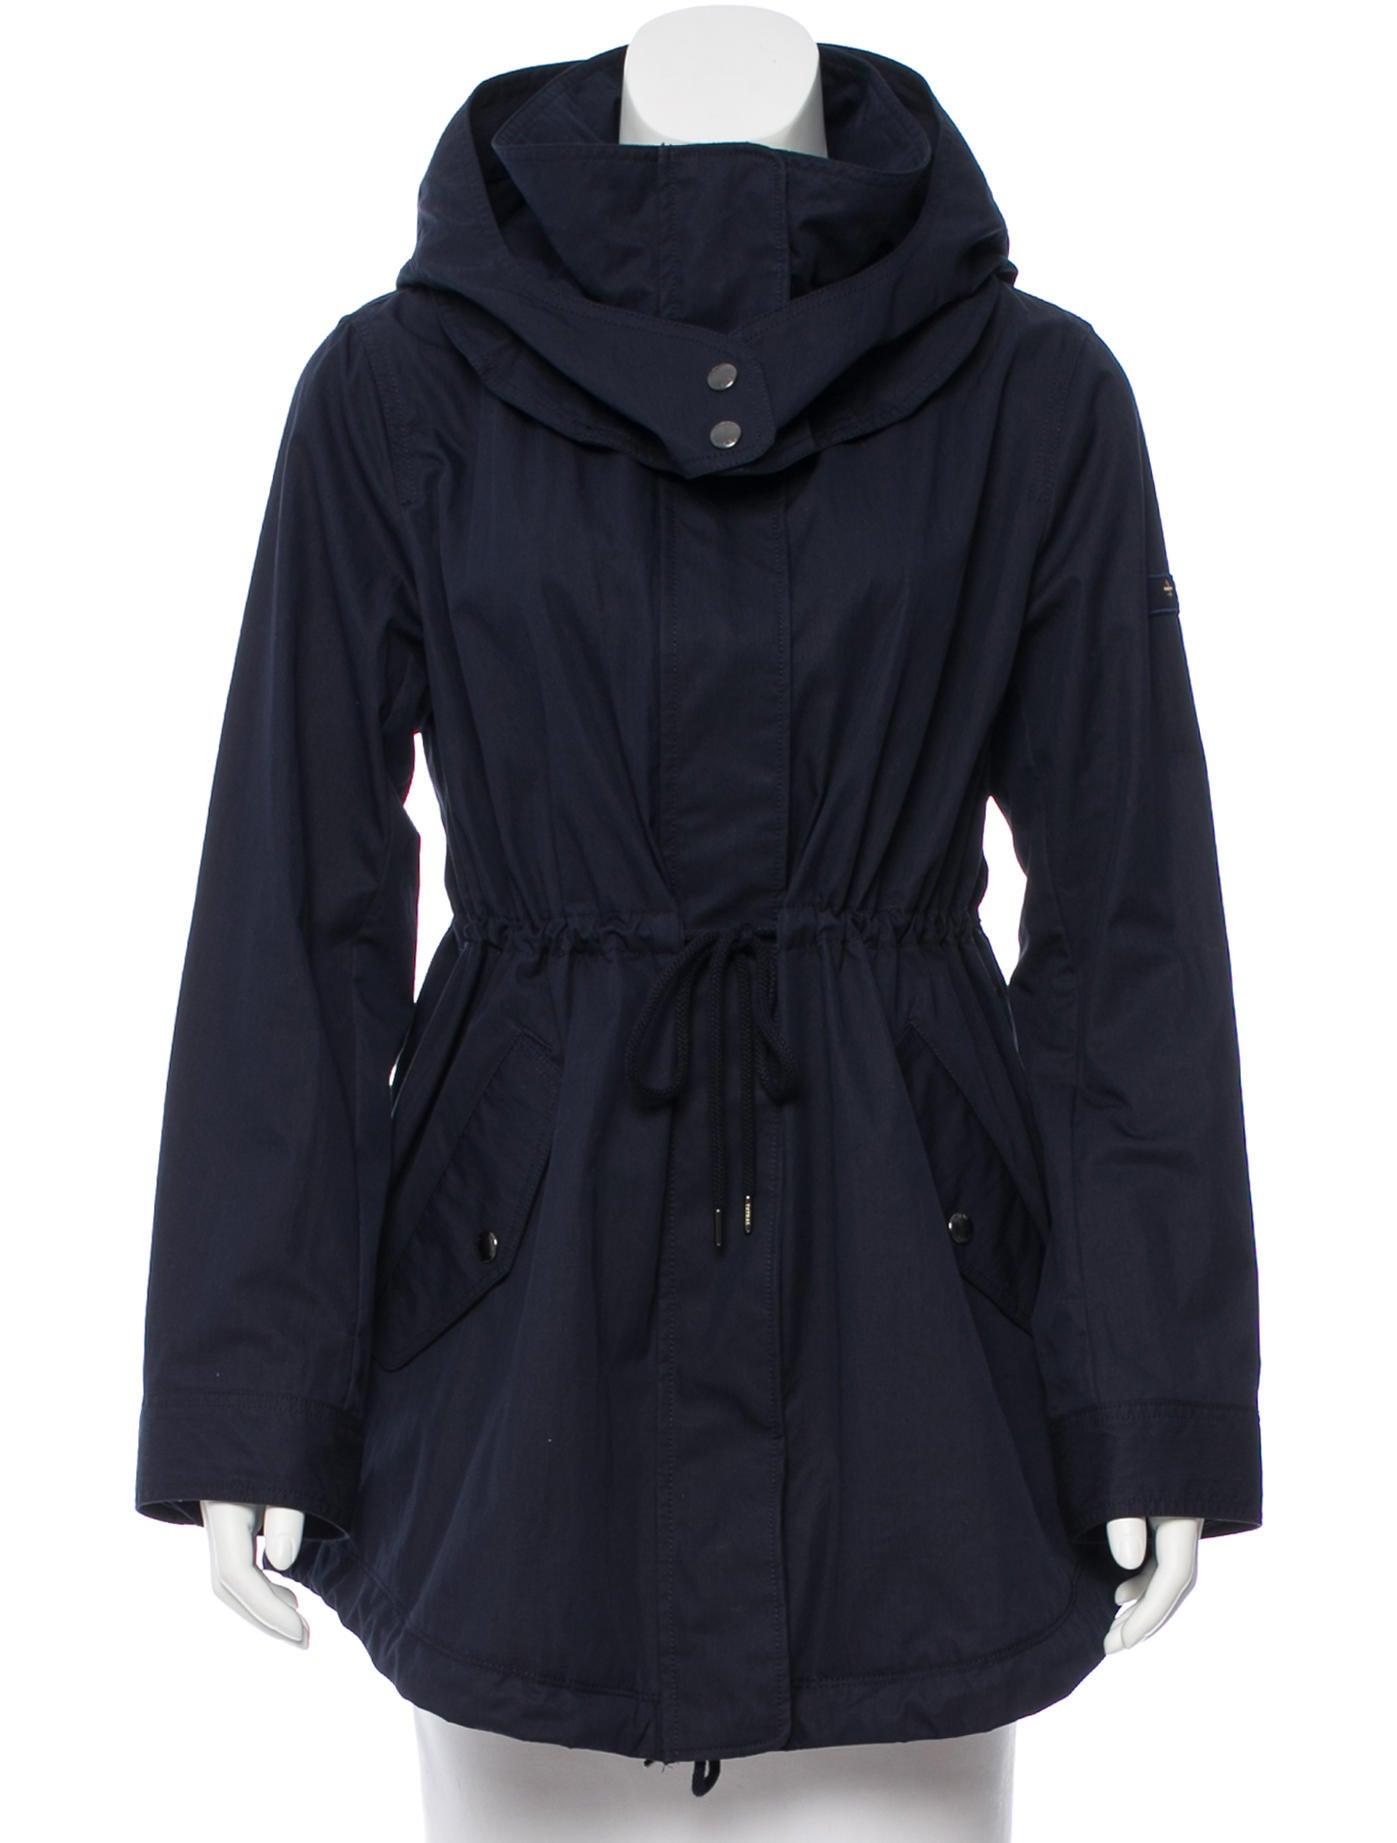 Utility Jacket Jackets And Nike: Tatras Hooded Utility Jacket W/ Tags